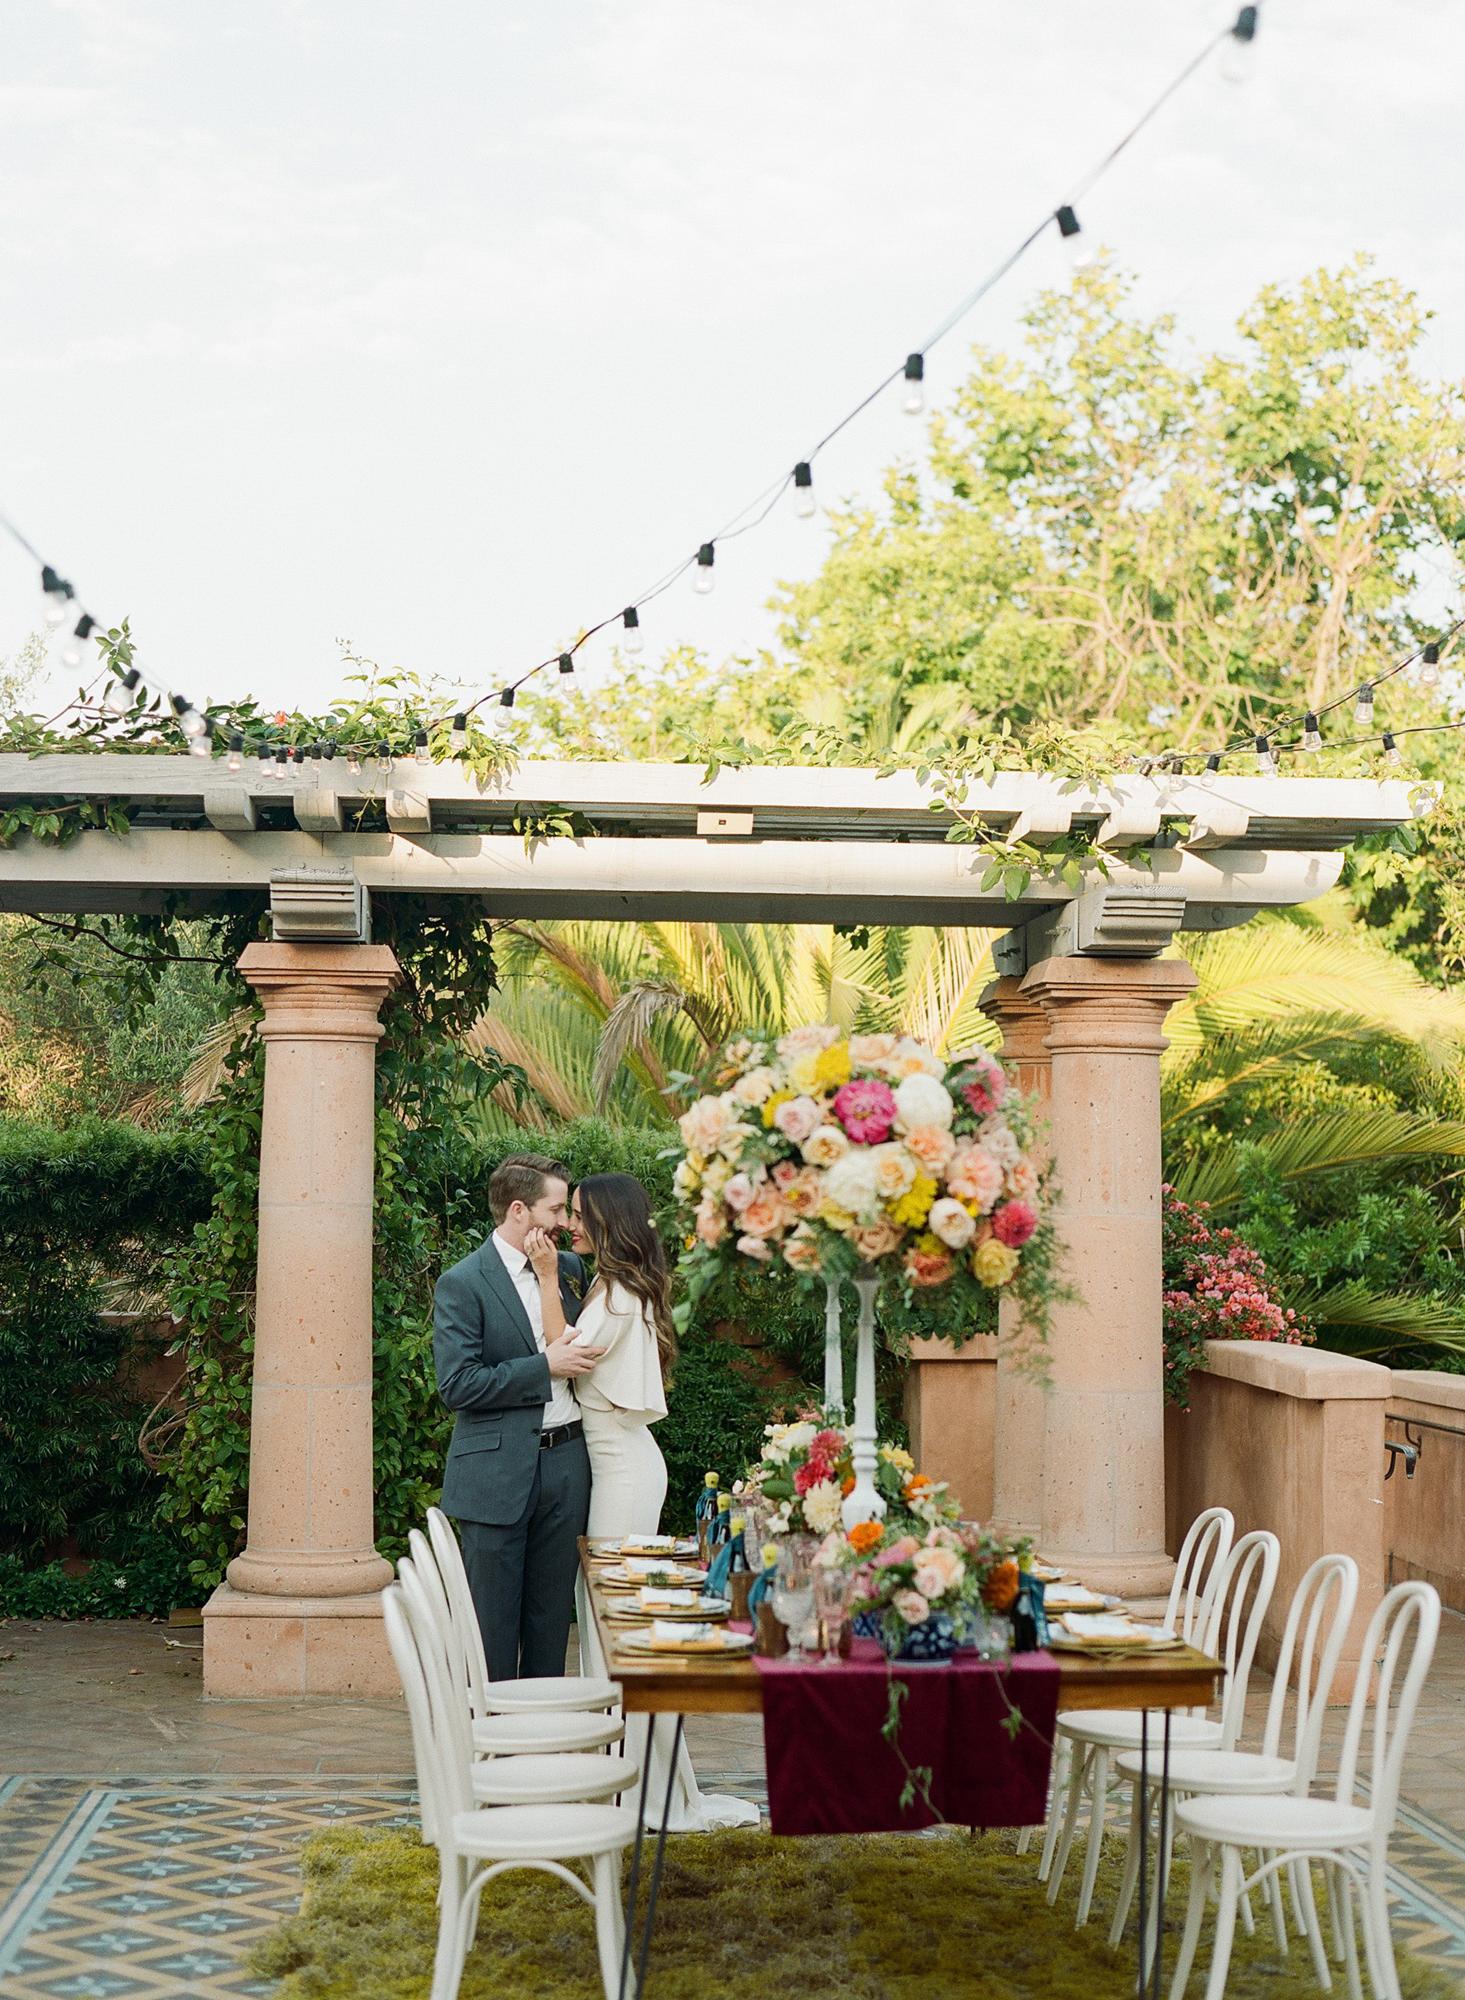 Rancho-Valencia-wedding-blooms-by-breesa-lee-rochelle-cheever-francine-ribeau-luxury-garden-rancho-santa-fe-hey-there-cupcake-adore-folklore-437.JPG